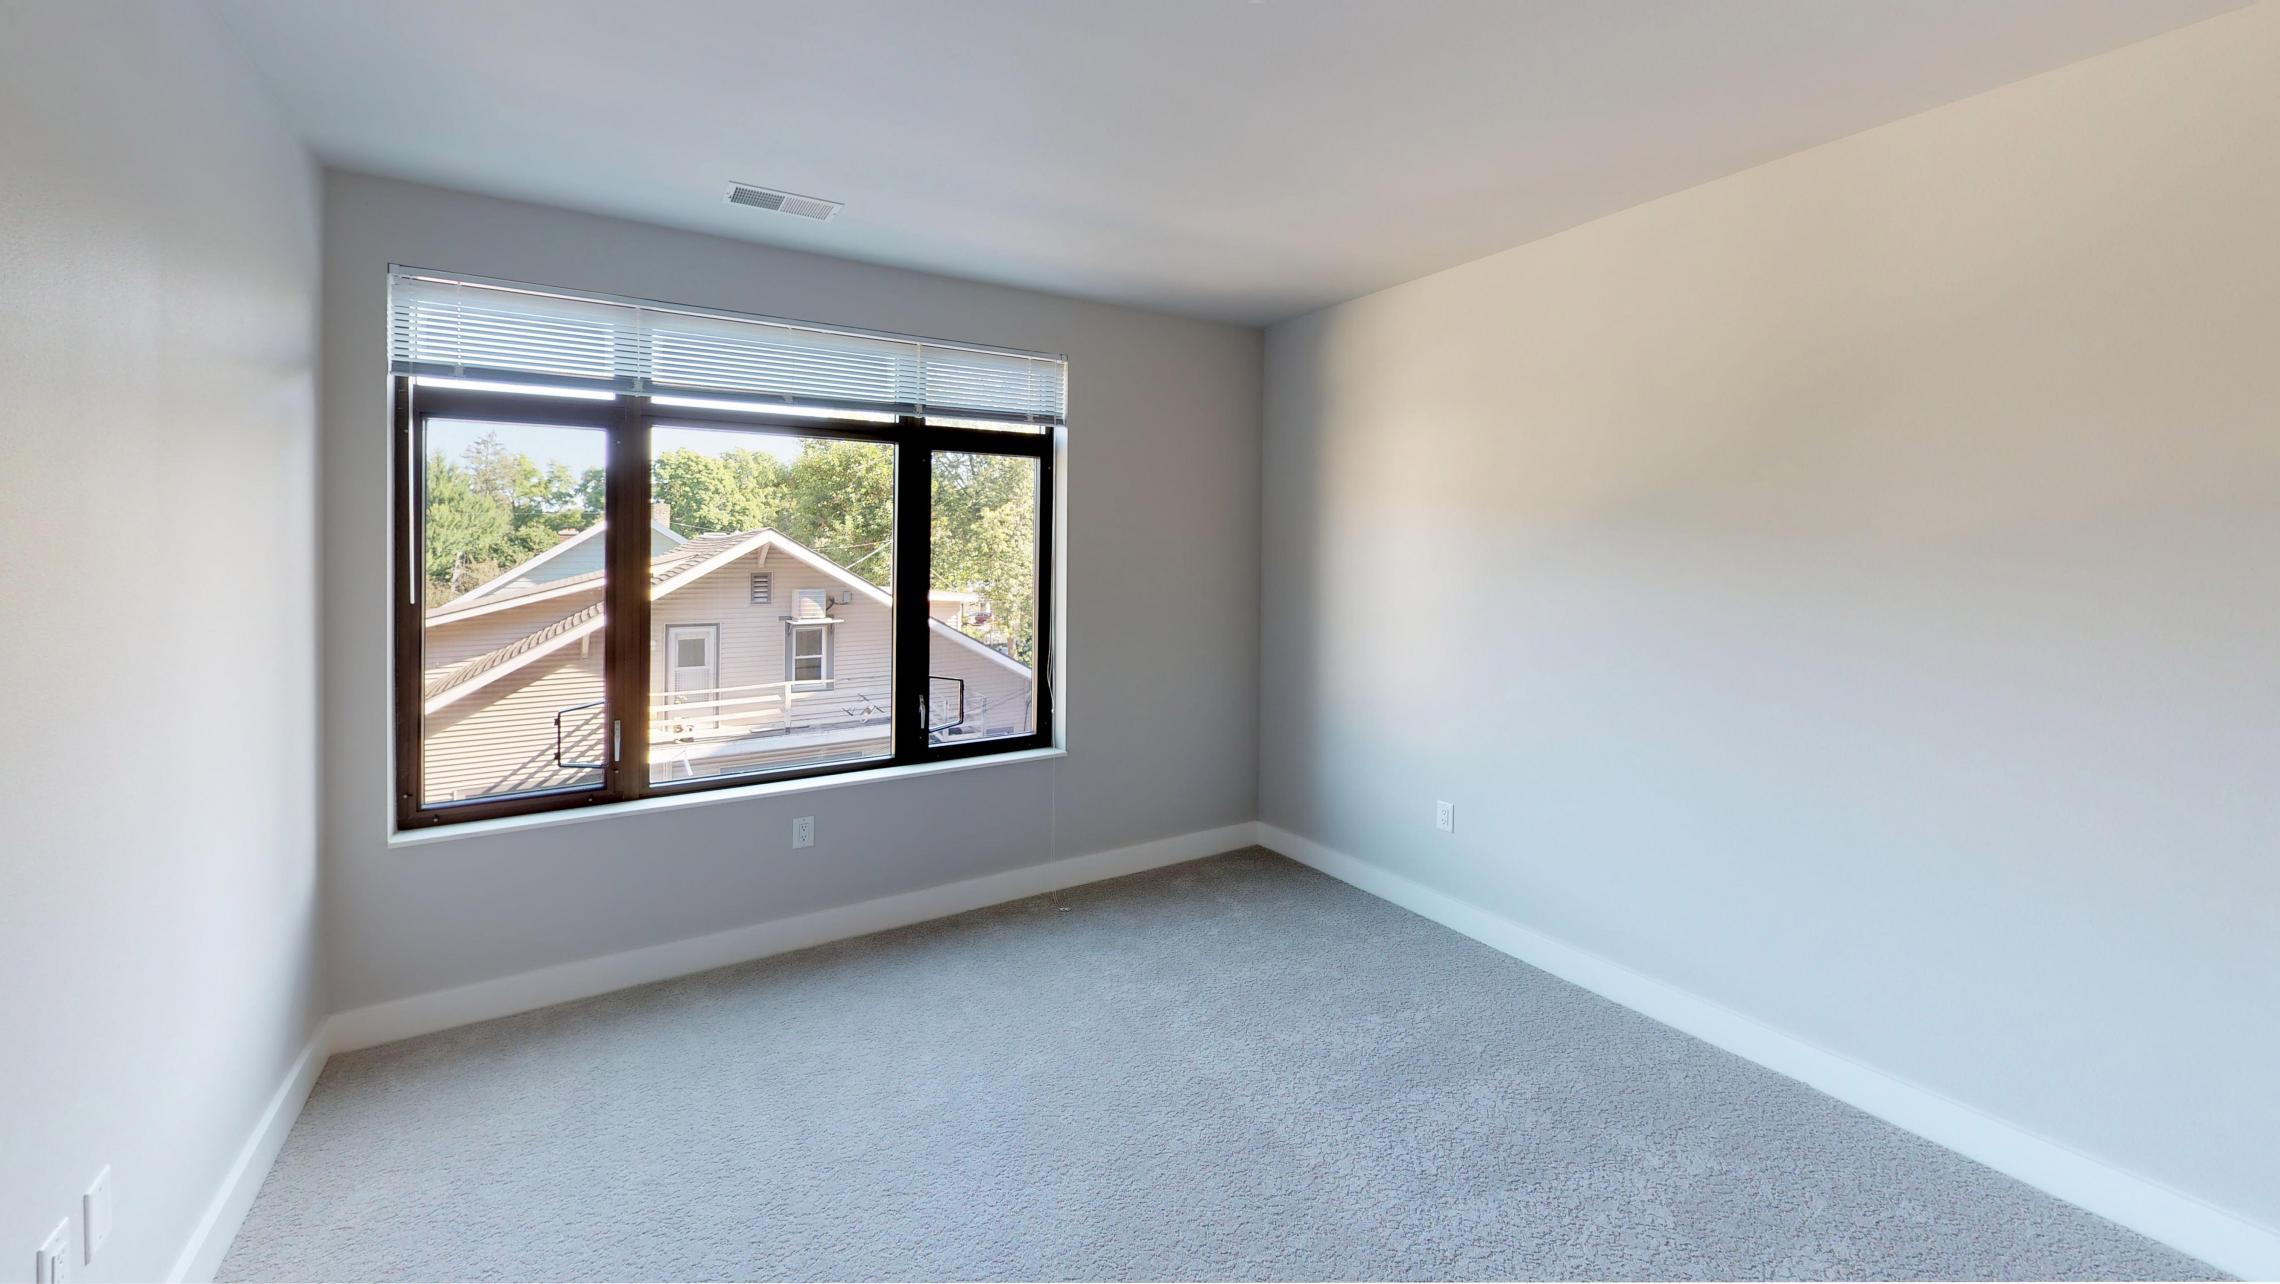 1722-Monroe-Apartment-220-Three Bedroom-Modern-Luxury-Corner-Balcony-Urban-Living-Bathroom-Vanity-Tub